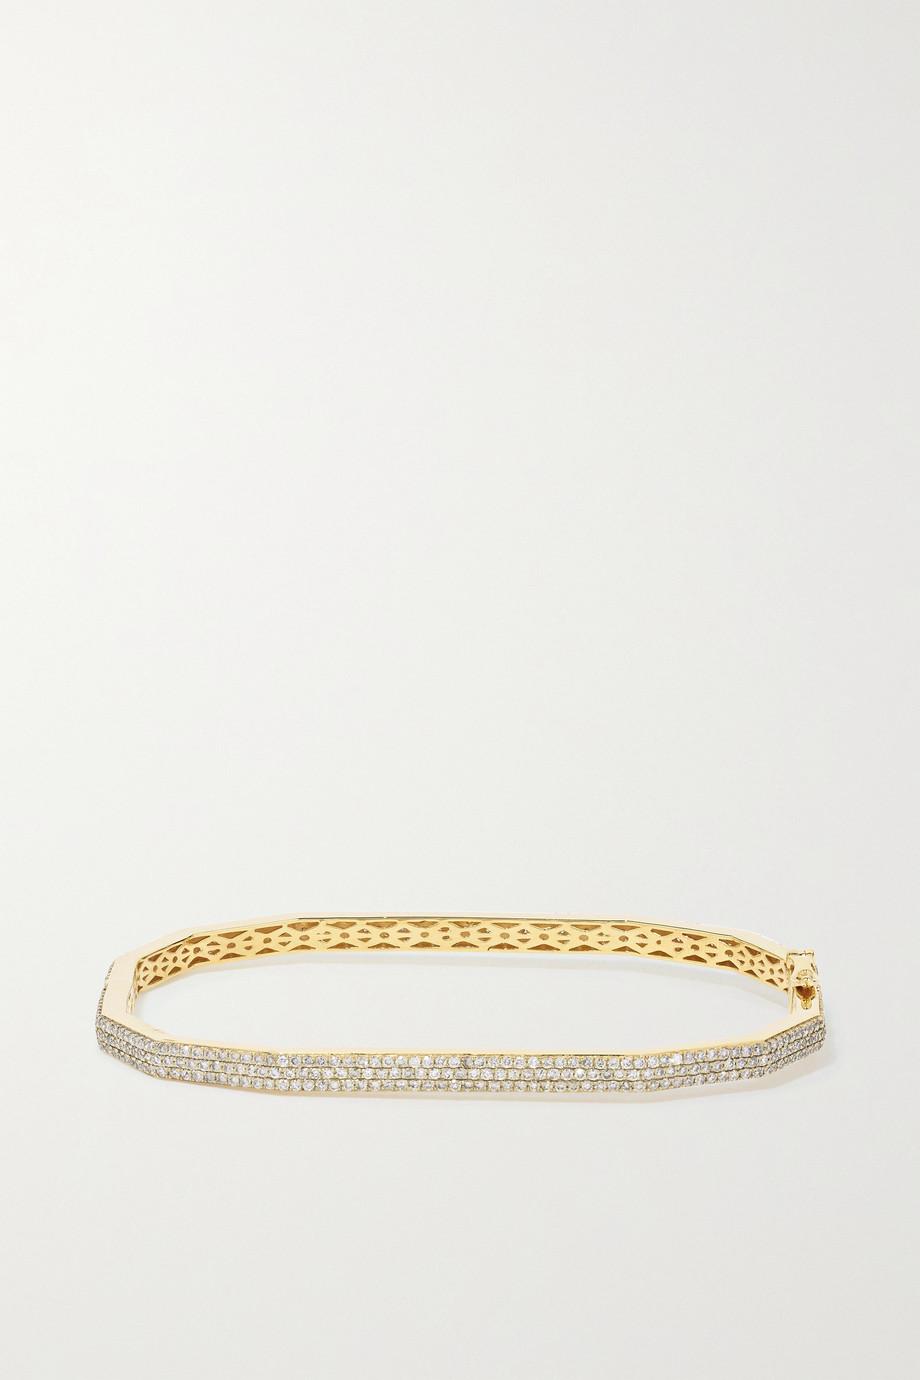 OFIRA 18-karat gold diamond bracelet